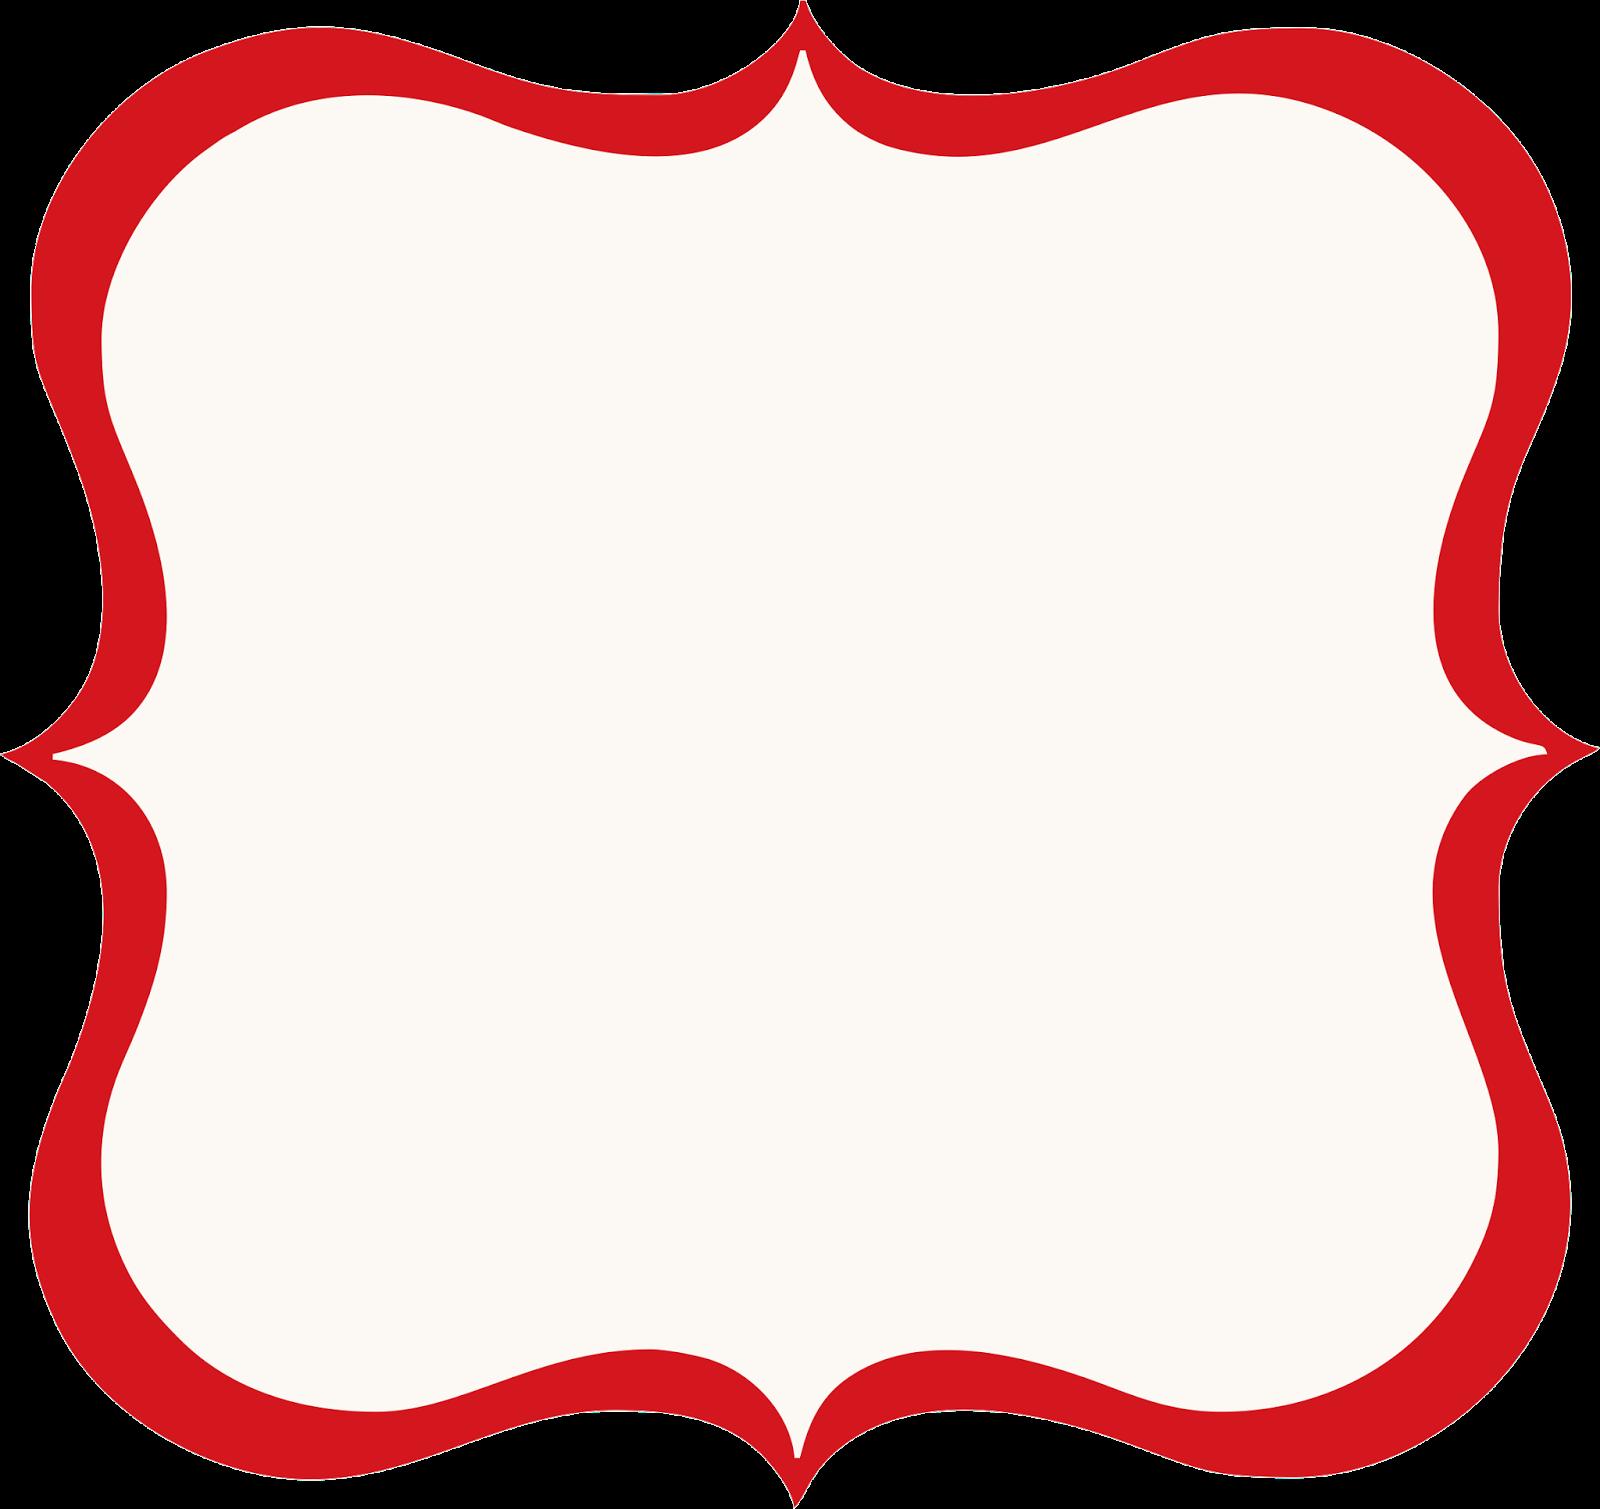 Pin de Jossana Polonini em arabescos.